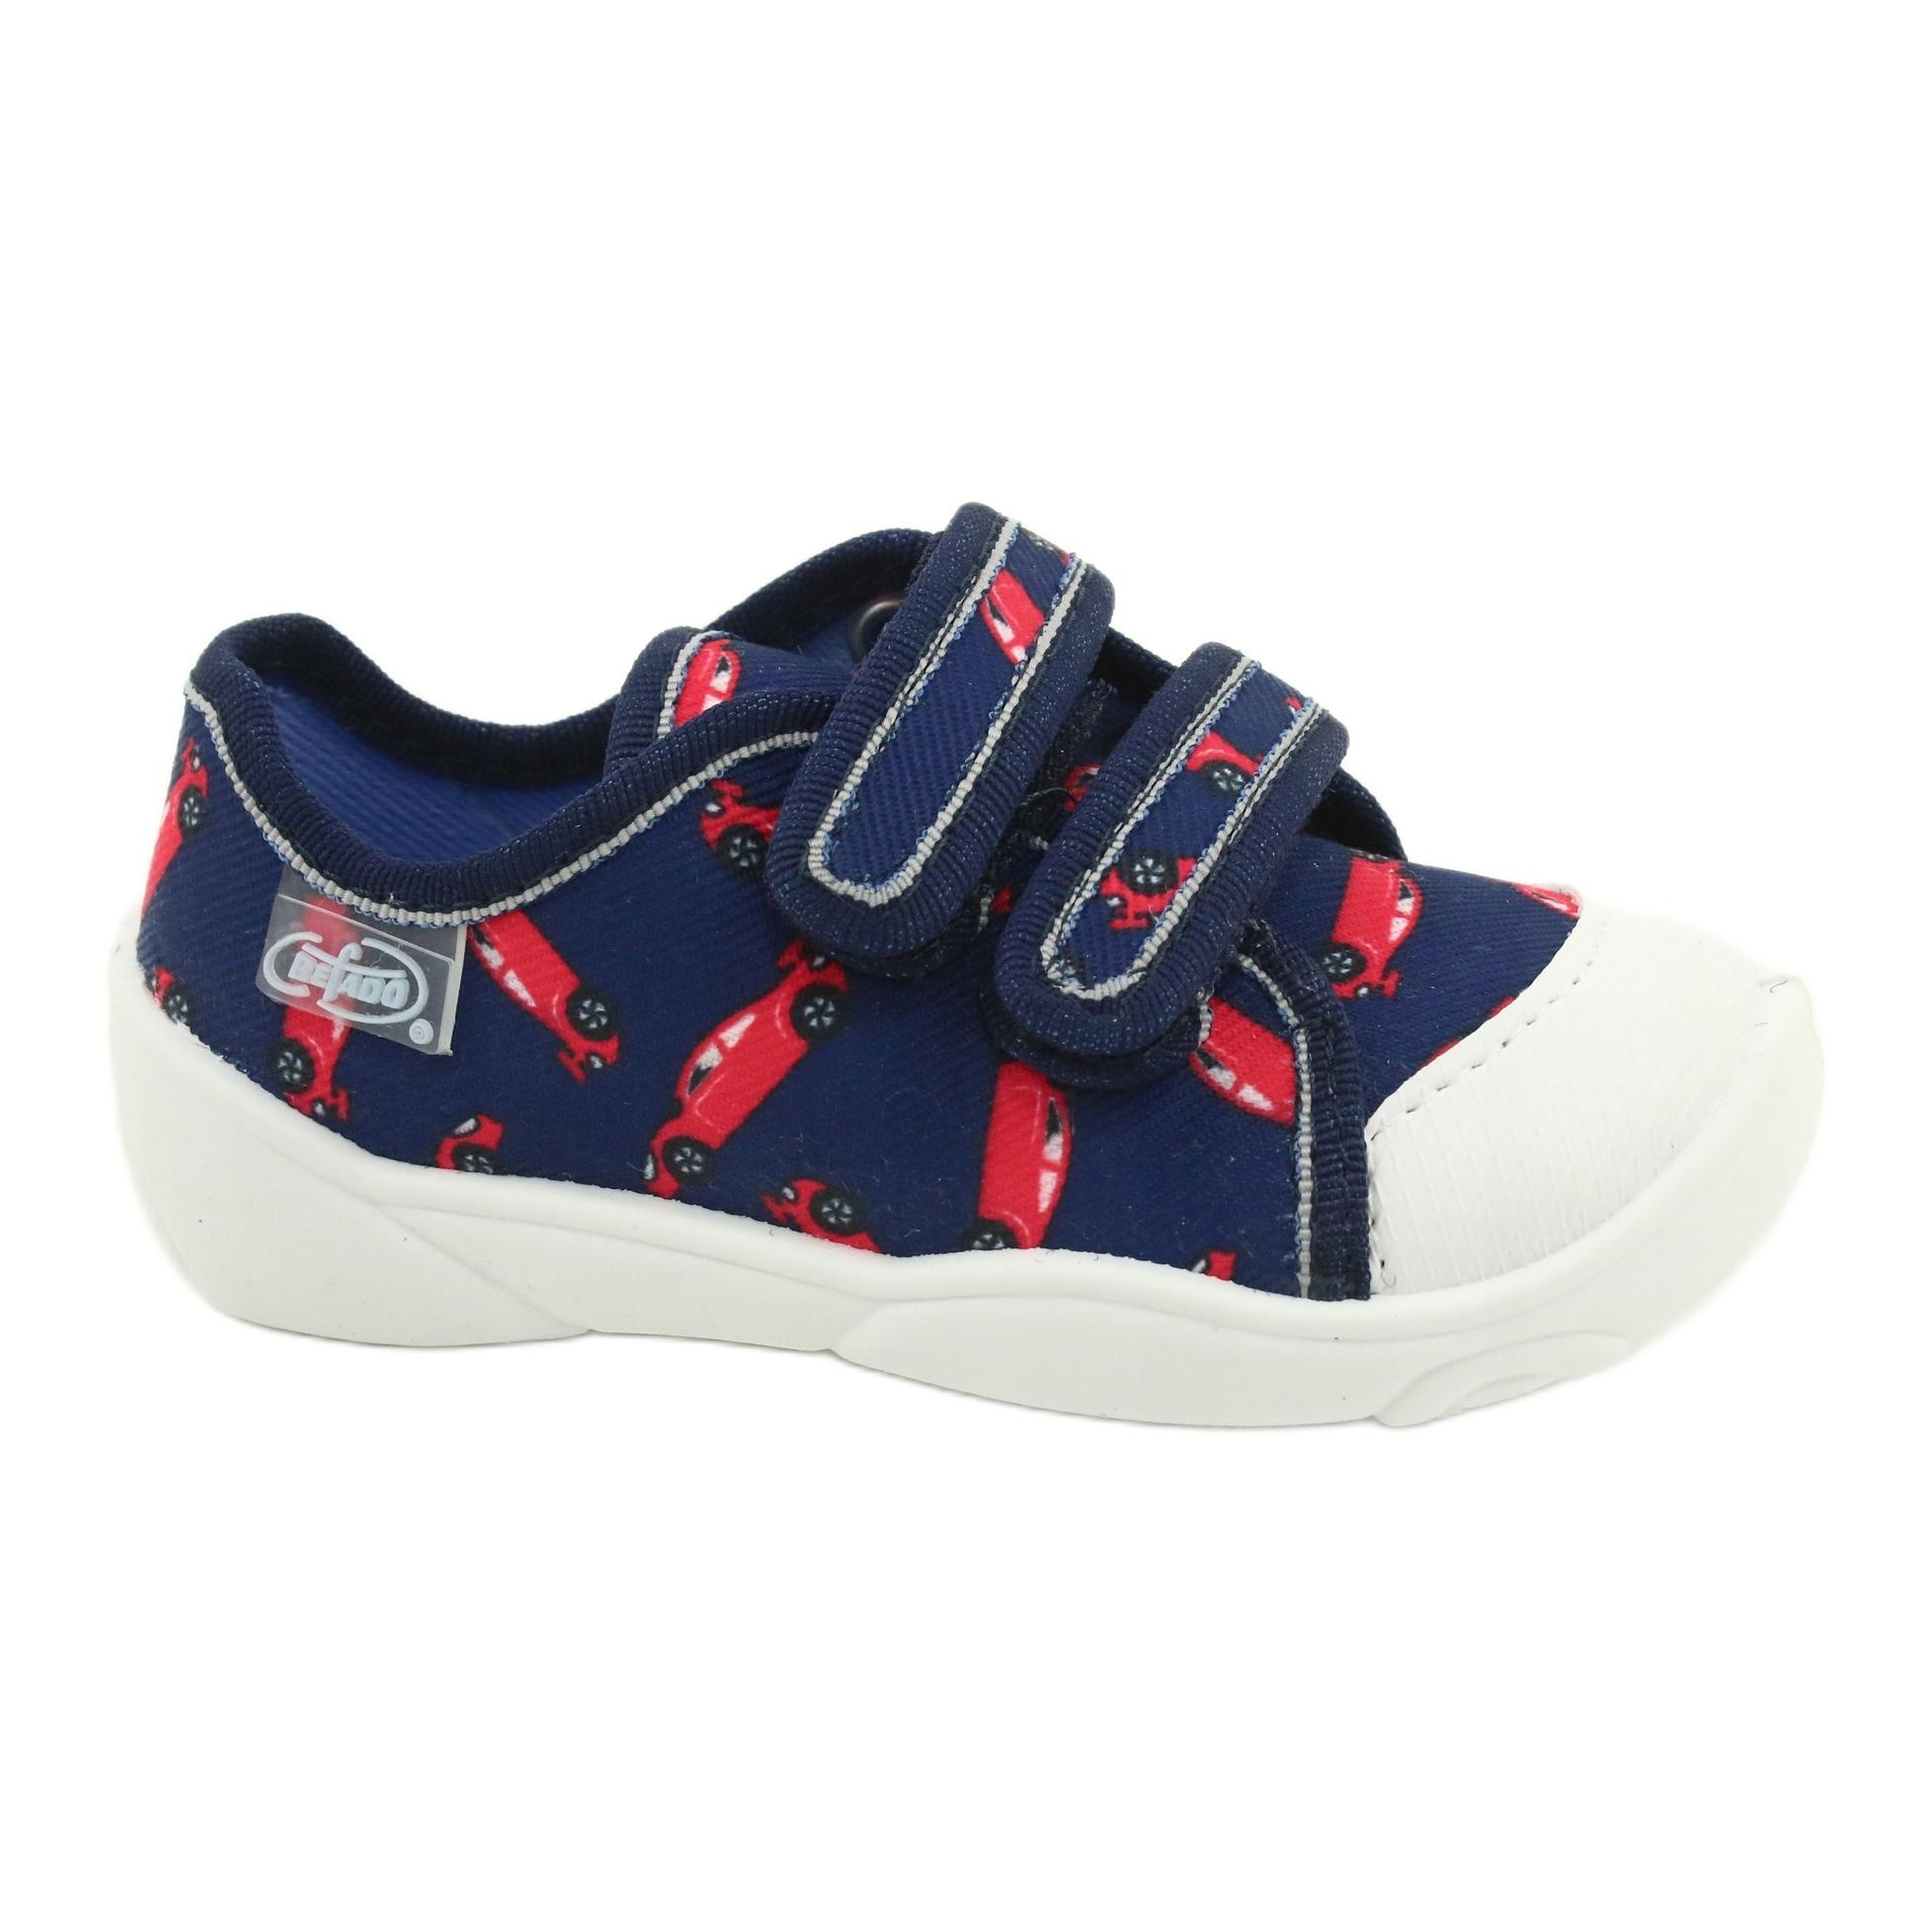 Befado yellow children/'s shoes 350P018 red navy